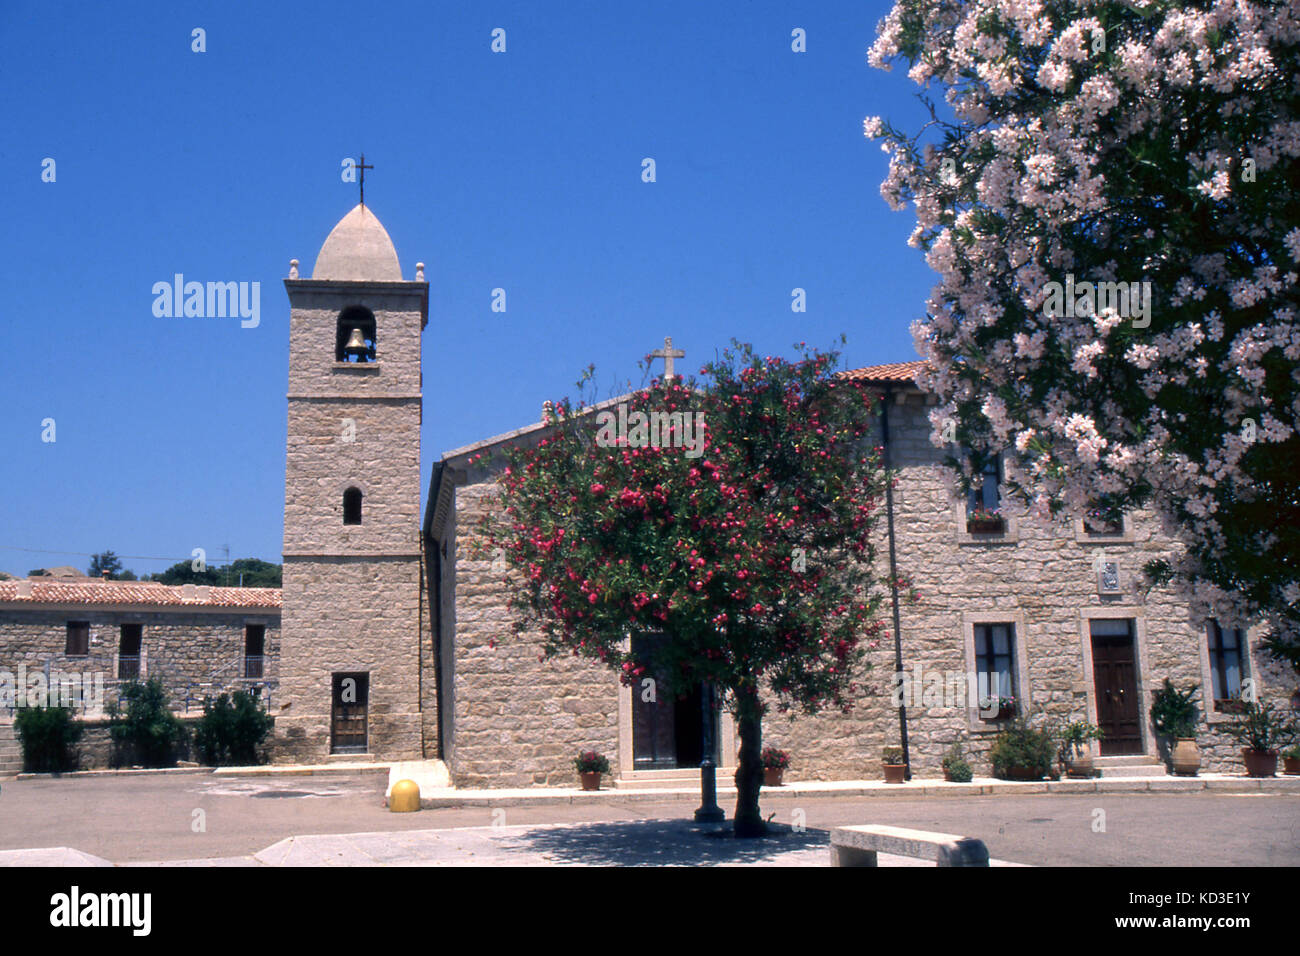 San Pantaleo, Olbia, Sardinia, The churche's square - Stock Image